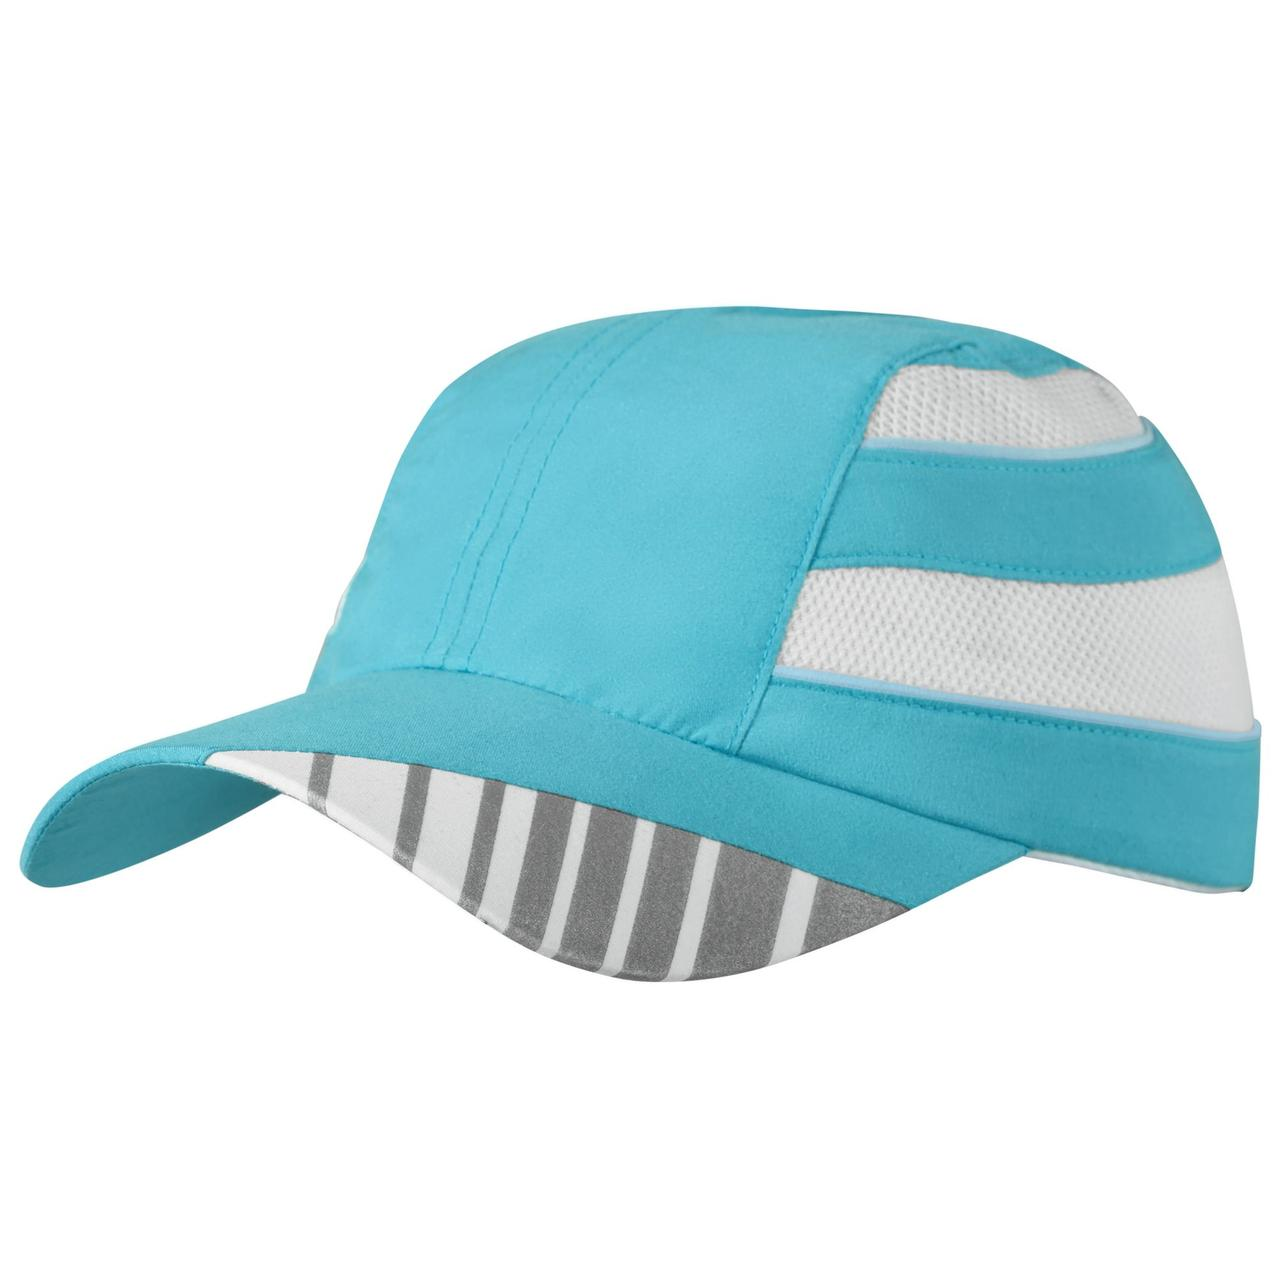 Бейсболка Ben Nevis со светоотражающим элементом, голубая (артикул 2387.14)